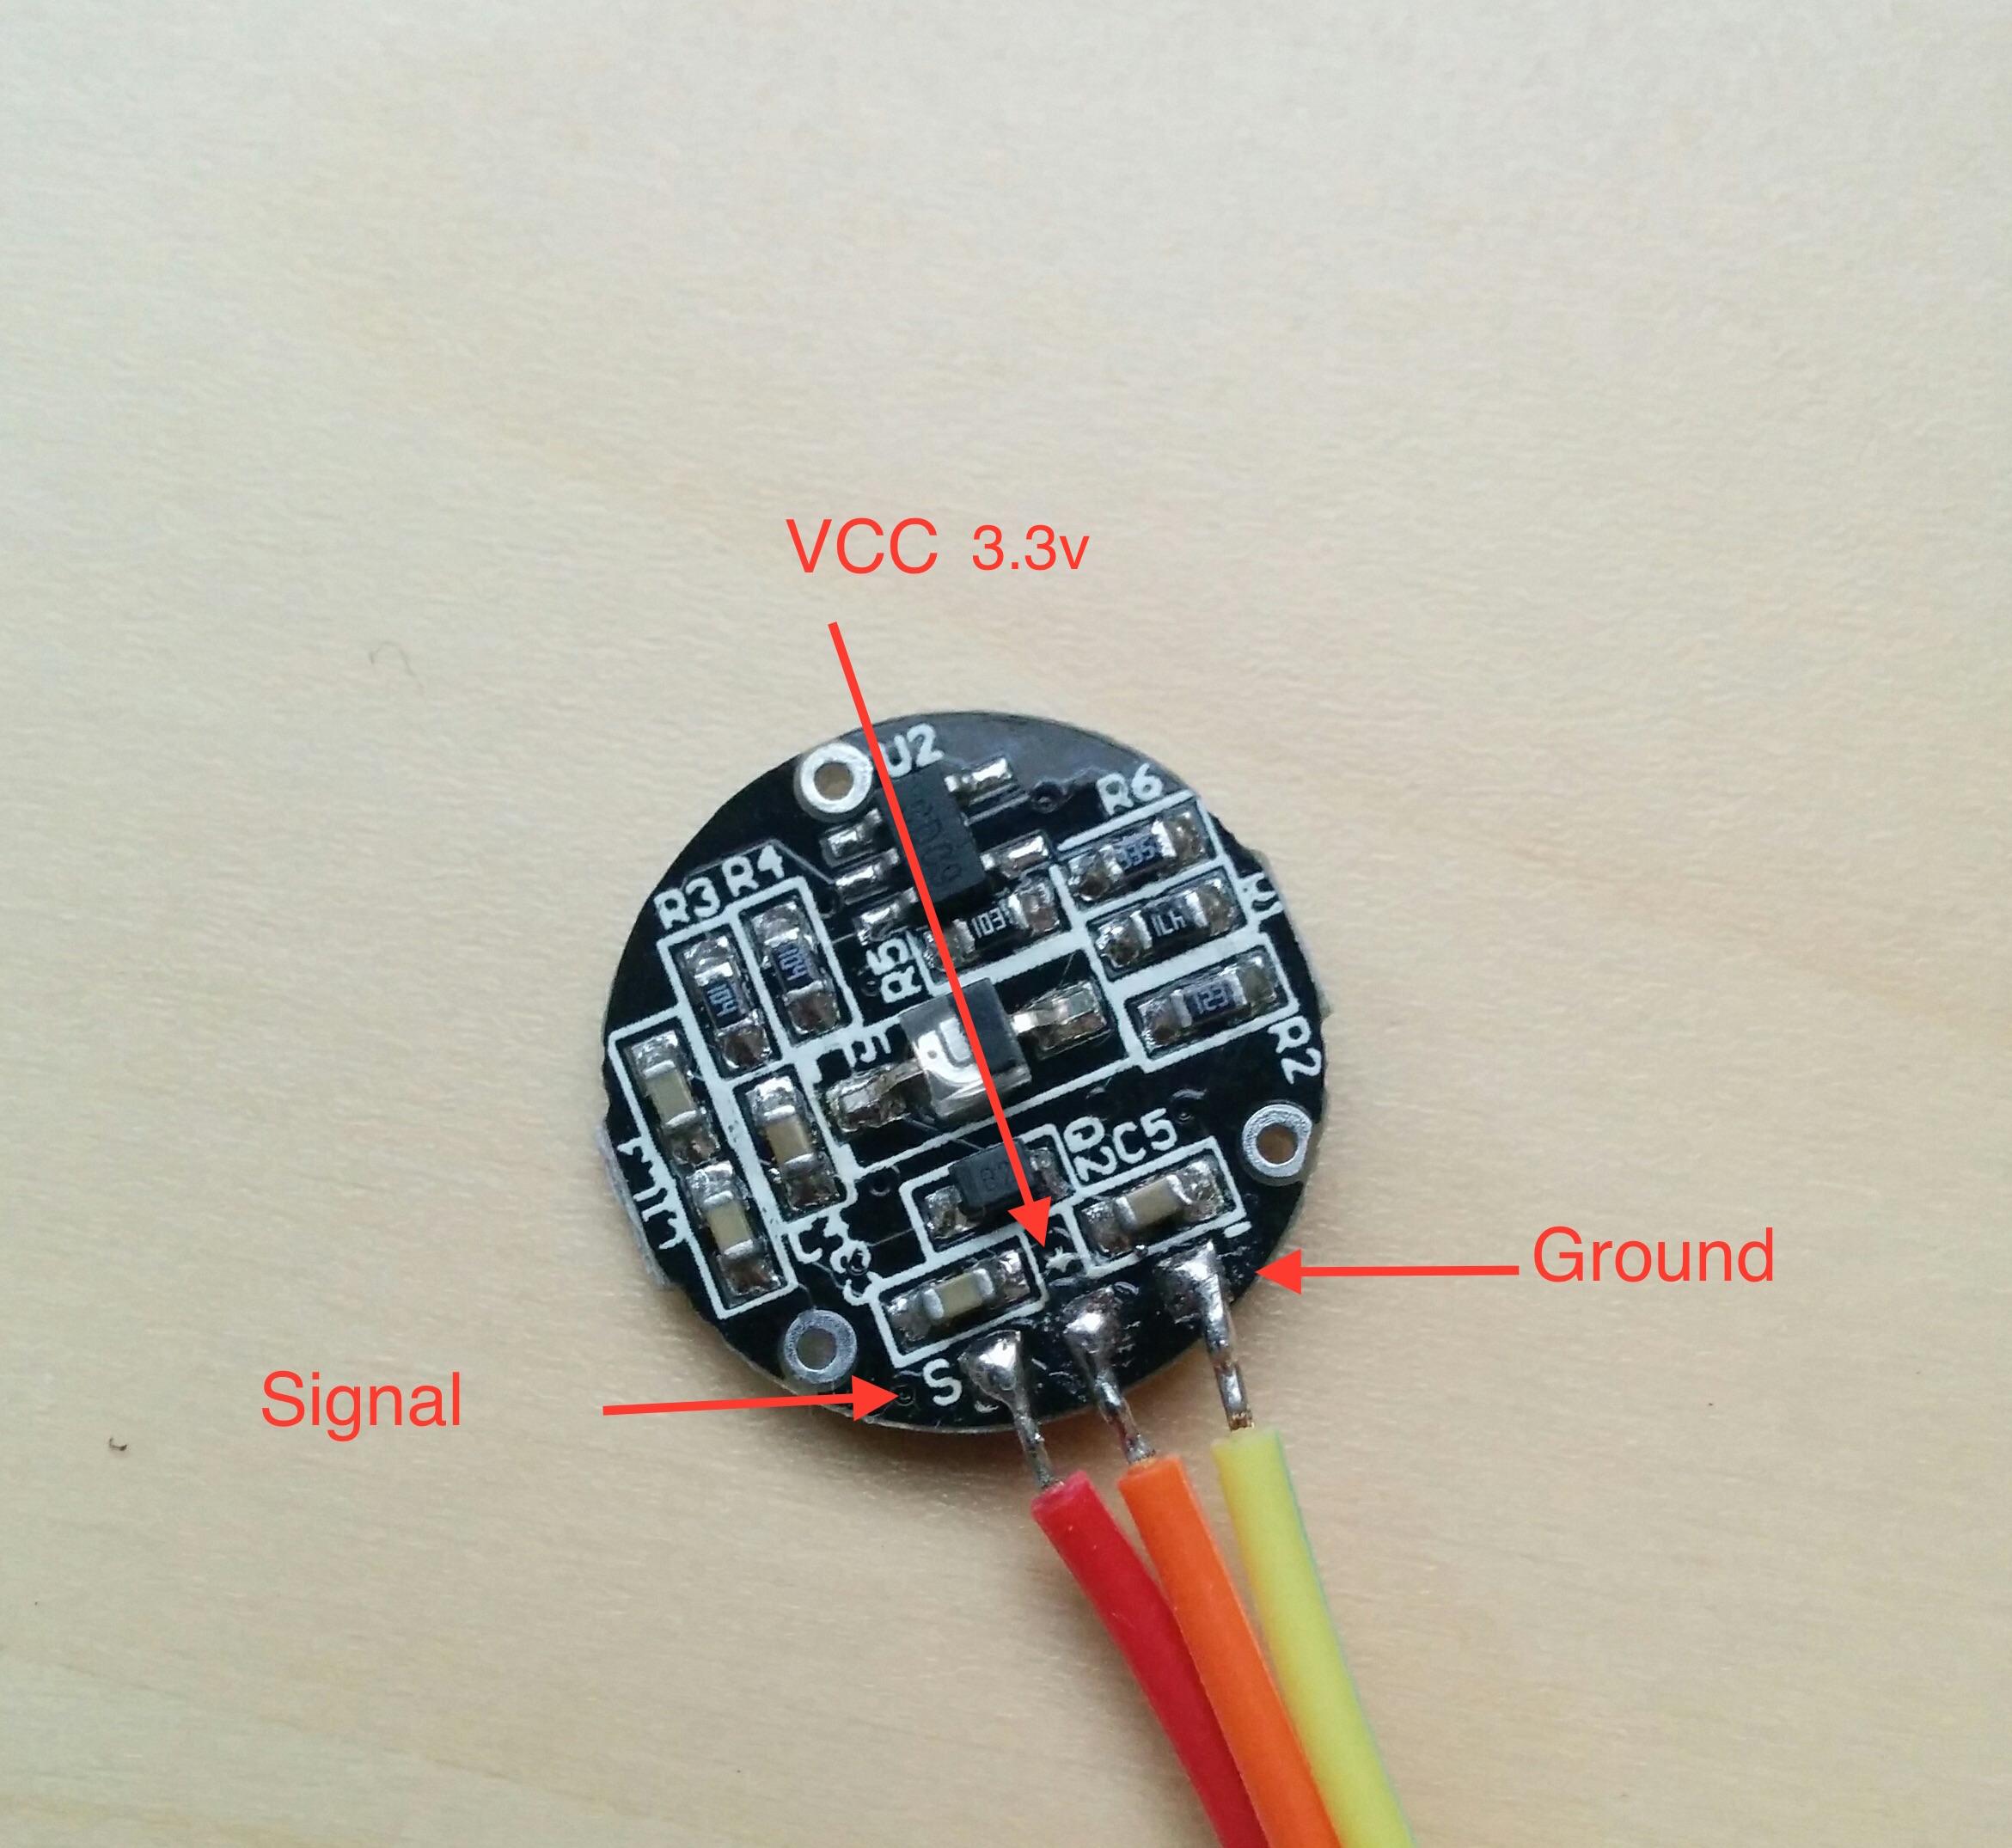 Heart Rate monitor using Raspberry Pi and Pulse sensor